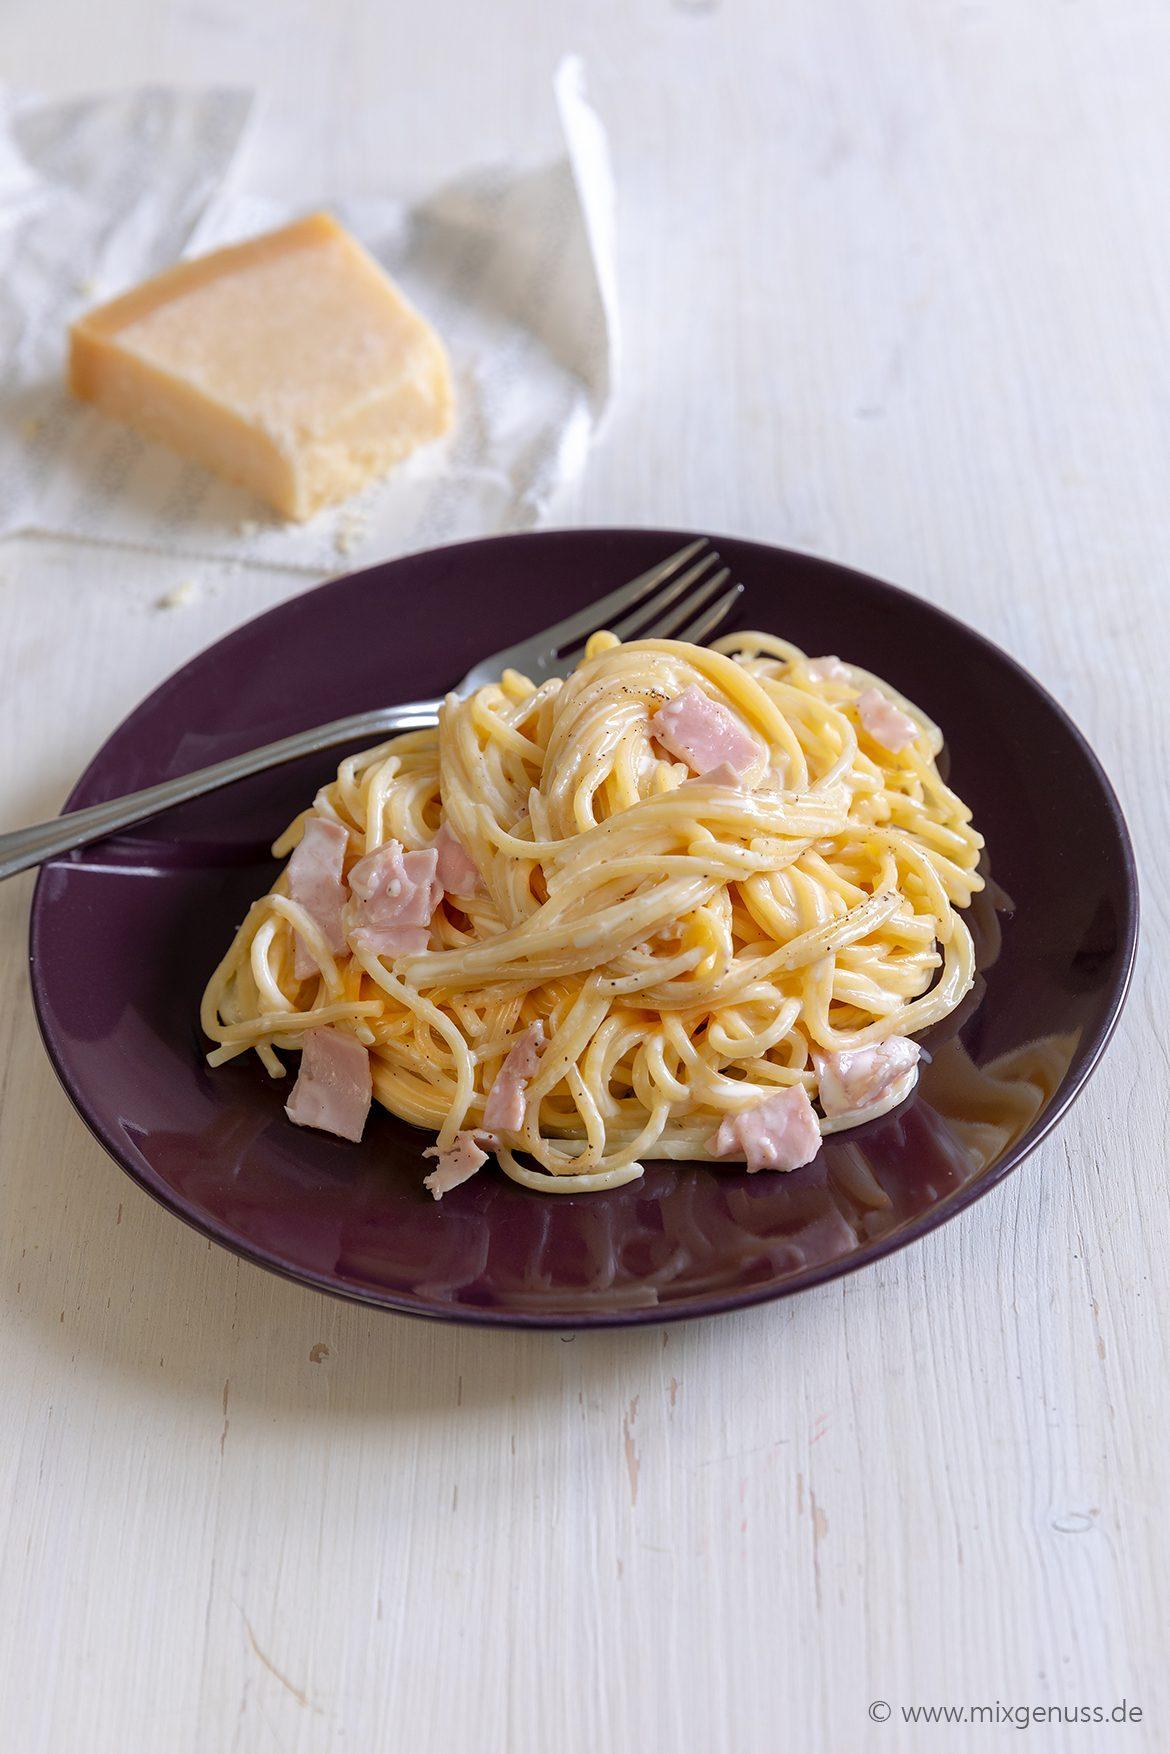 Spaghetti alla panna